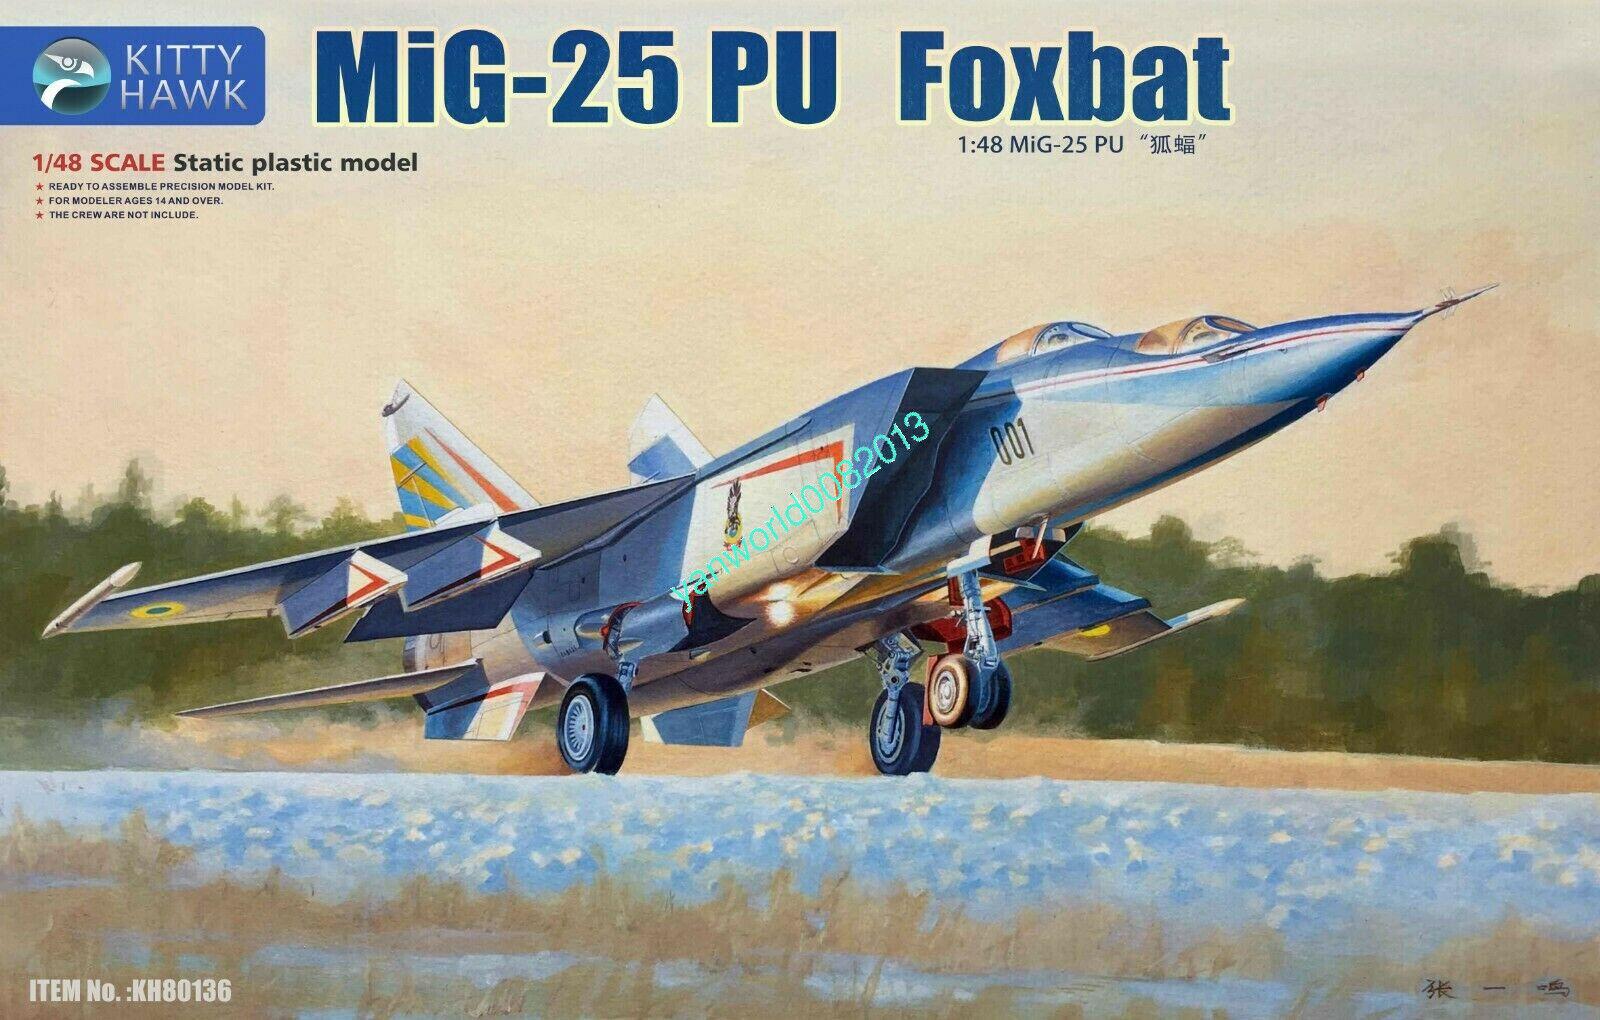 Kitty Hawk KH80136 1 48 Mig-25 PU Foxbat Model Buidling Kit,Released 2019 NEW